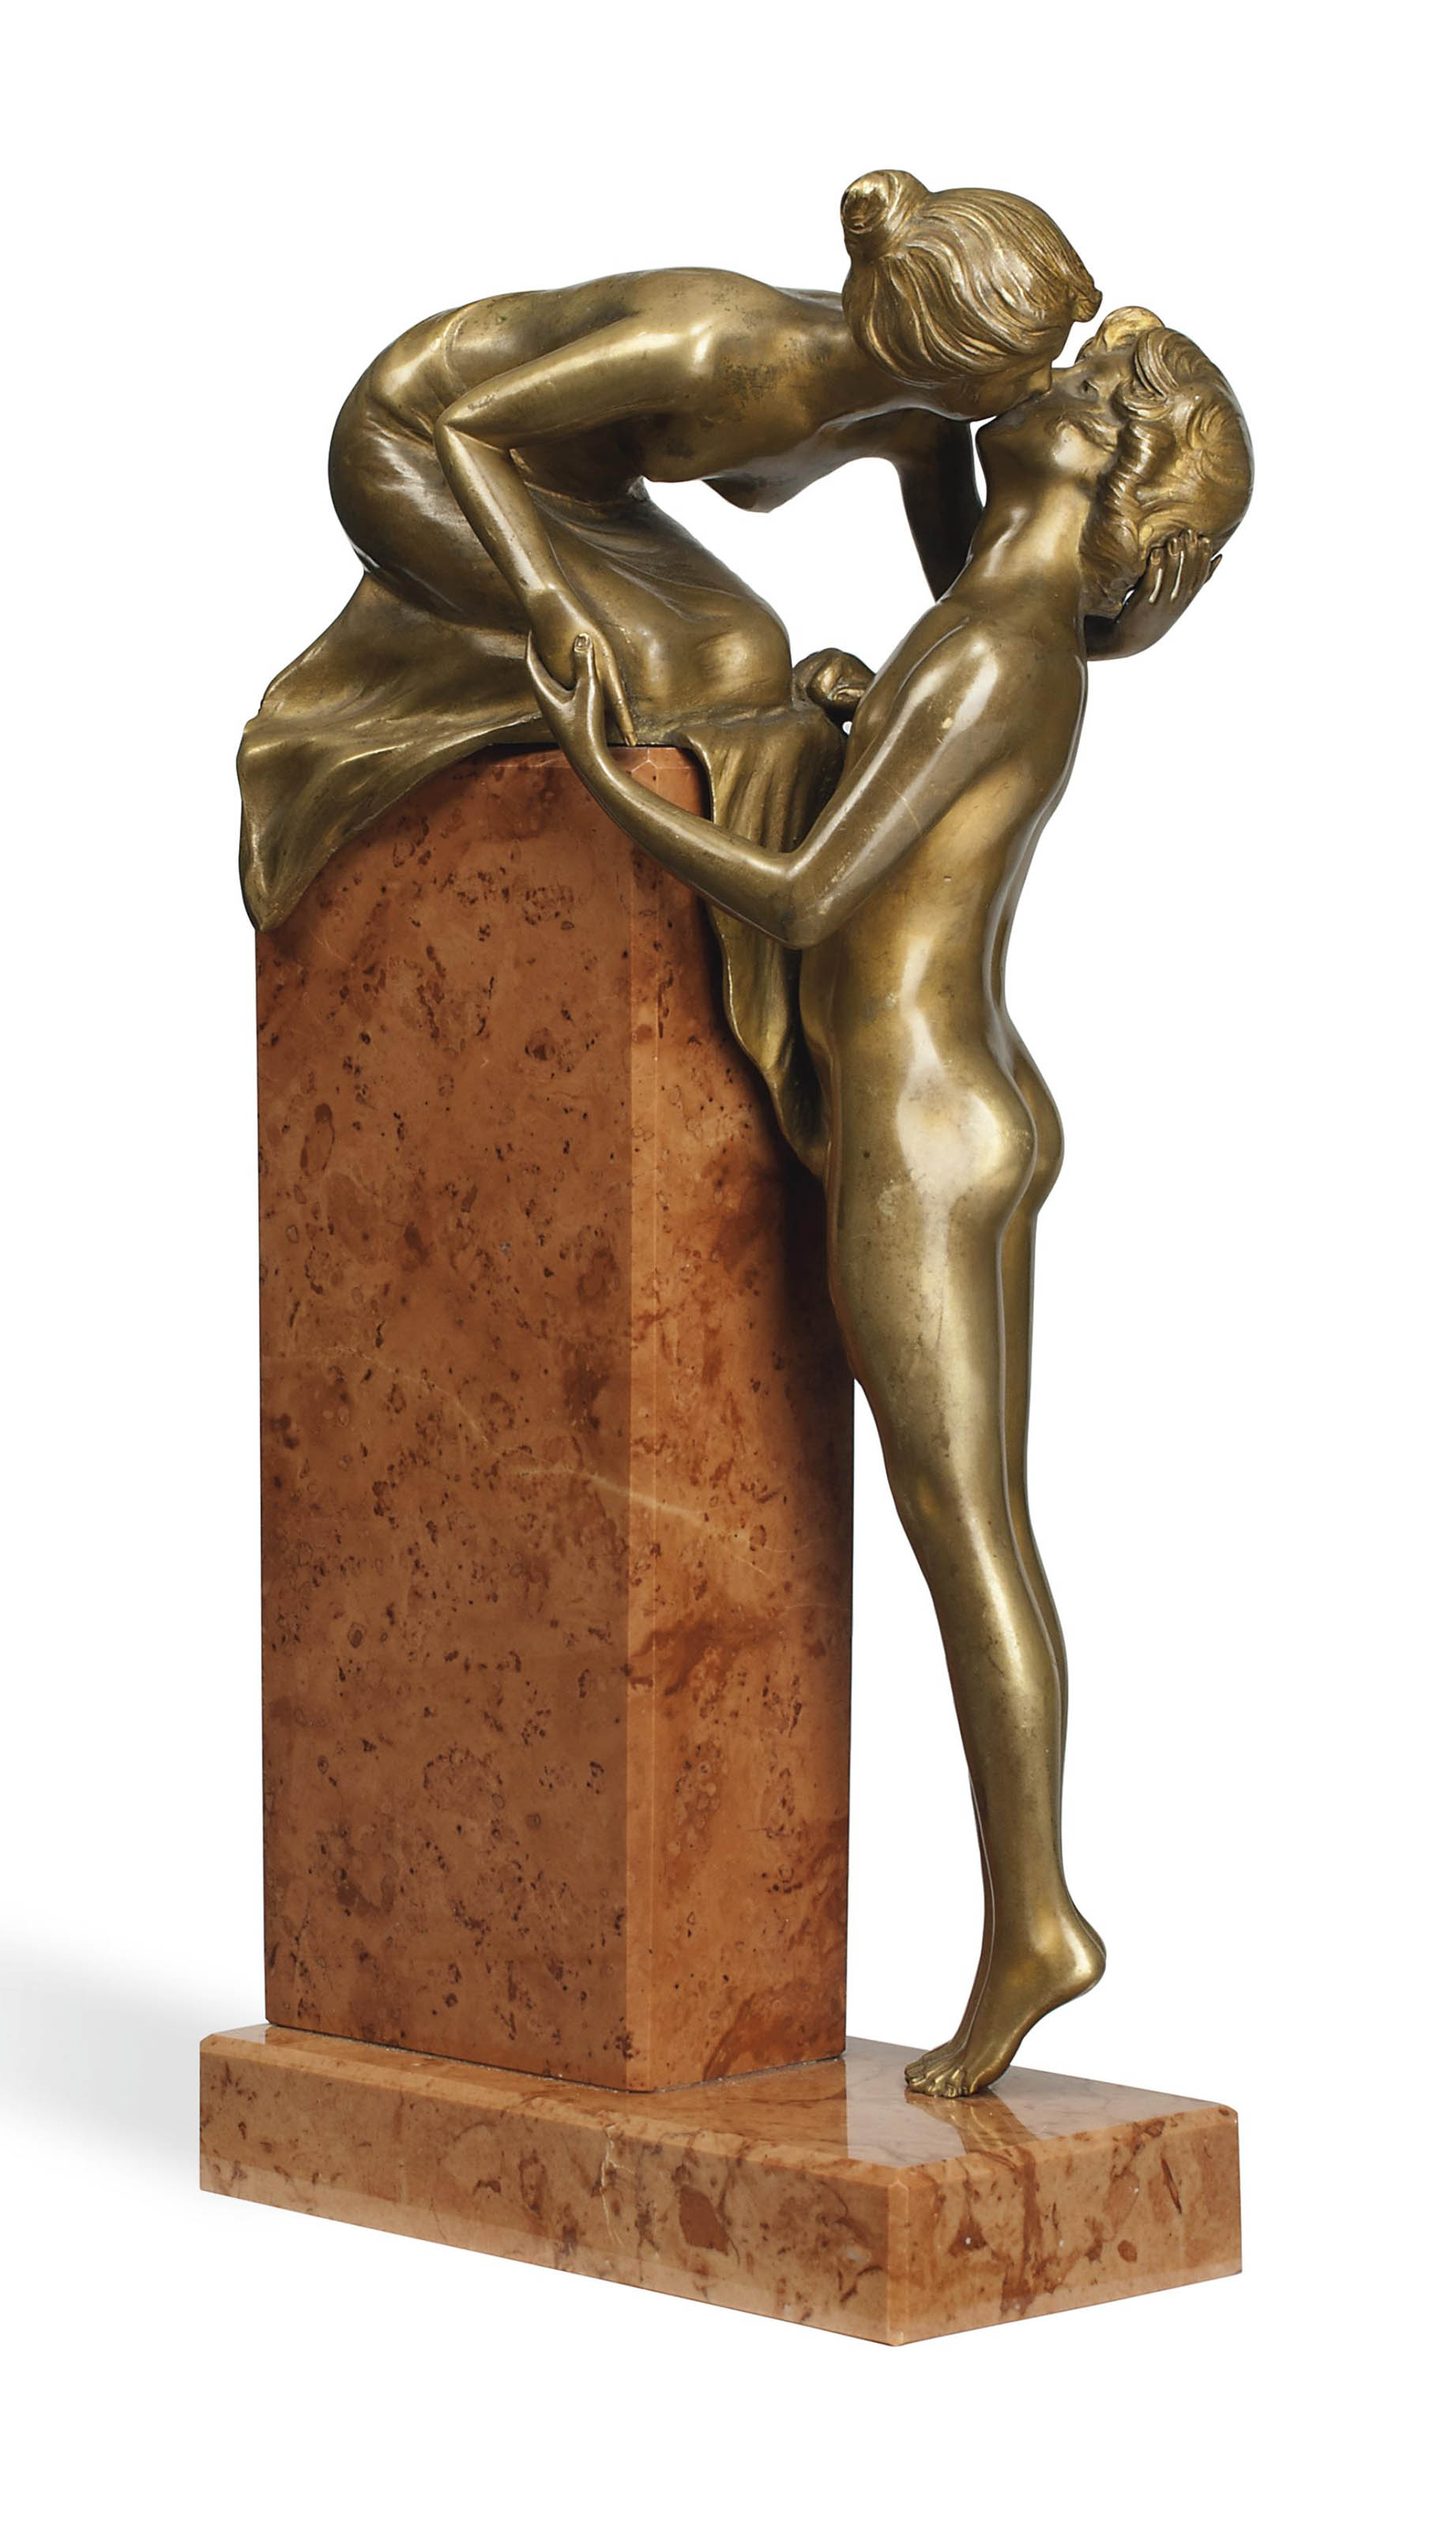 'THE KISS' A FRANZ XAVIER BERGMANN (1861-1936) COLD-PAINTED BRONZE  GROUP